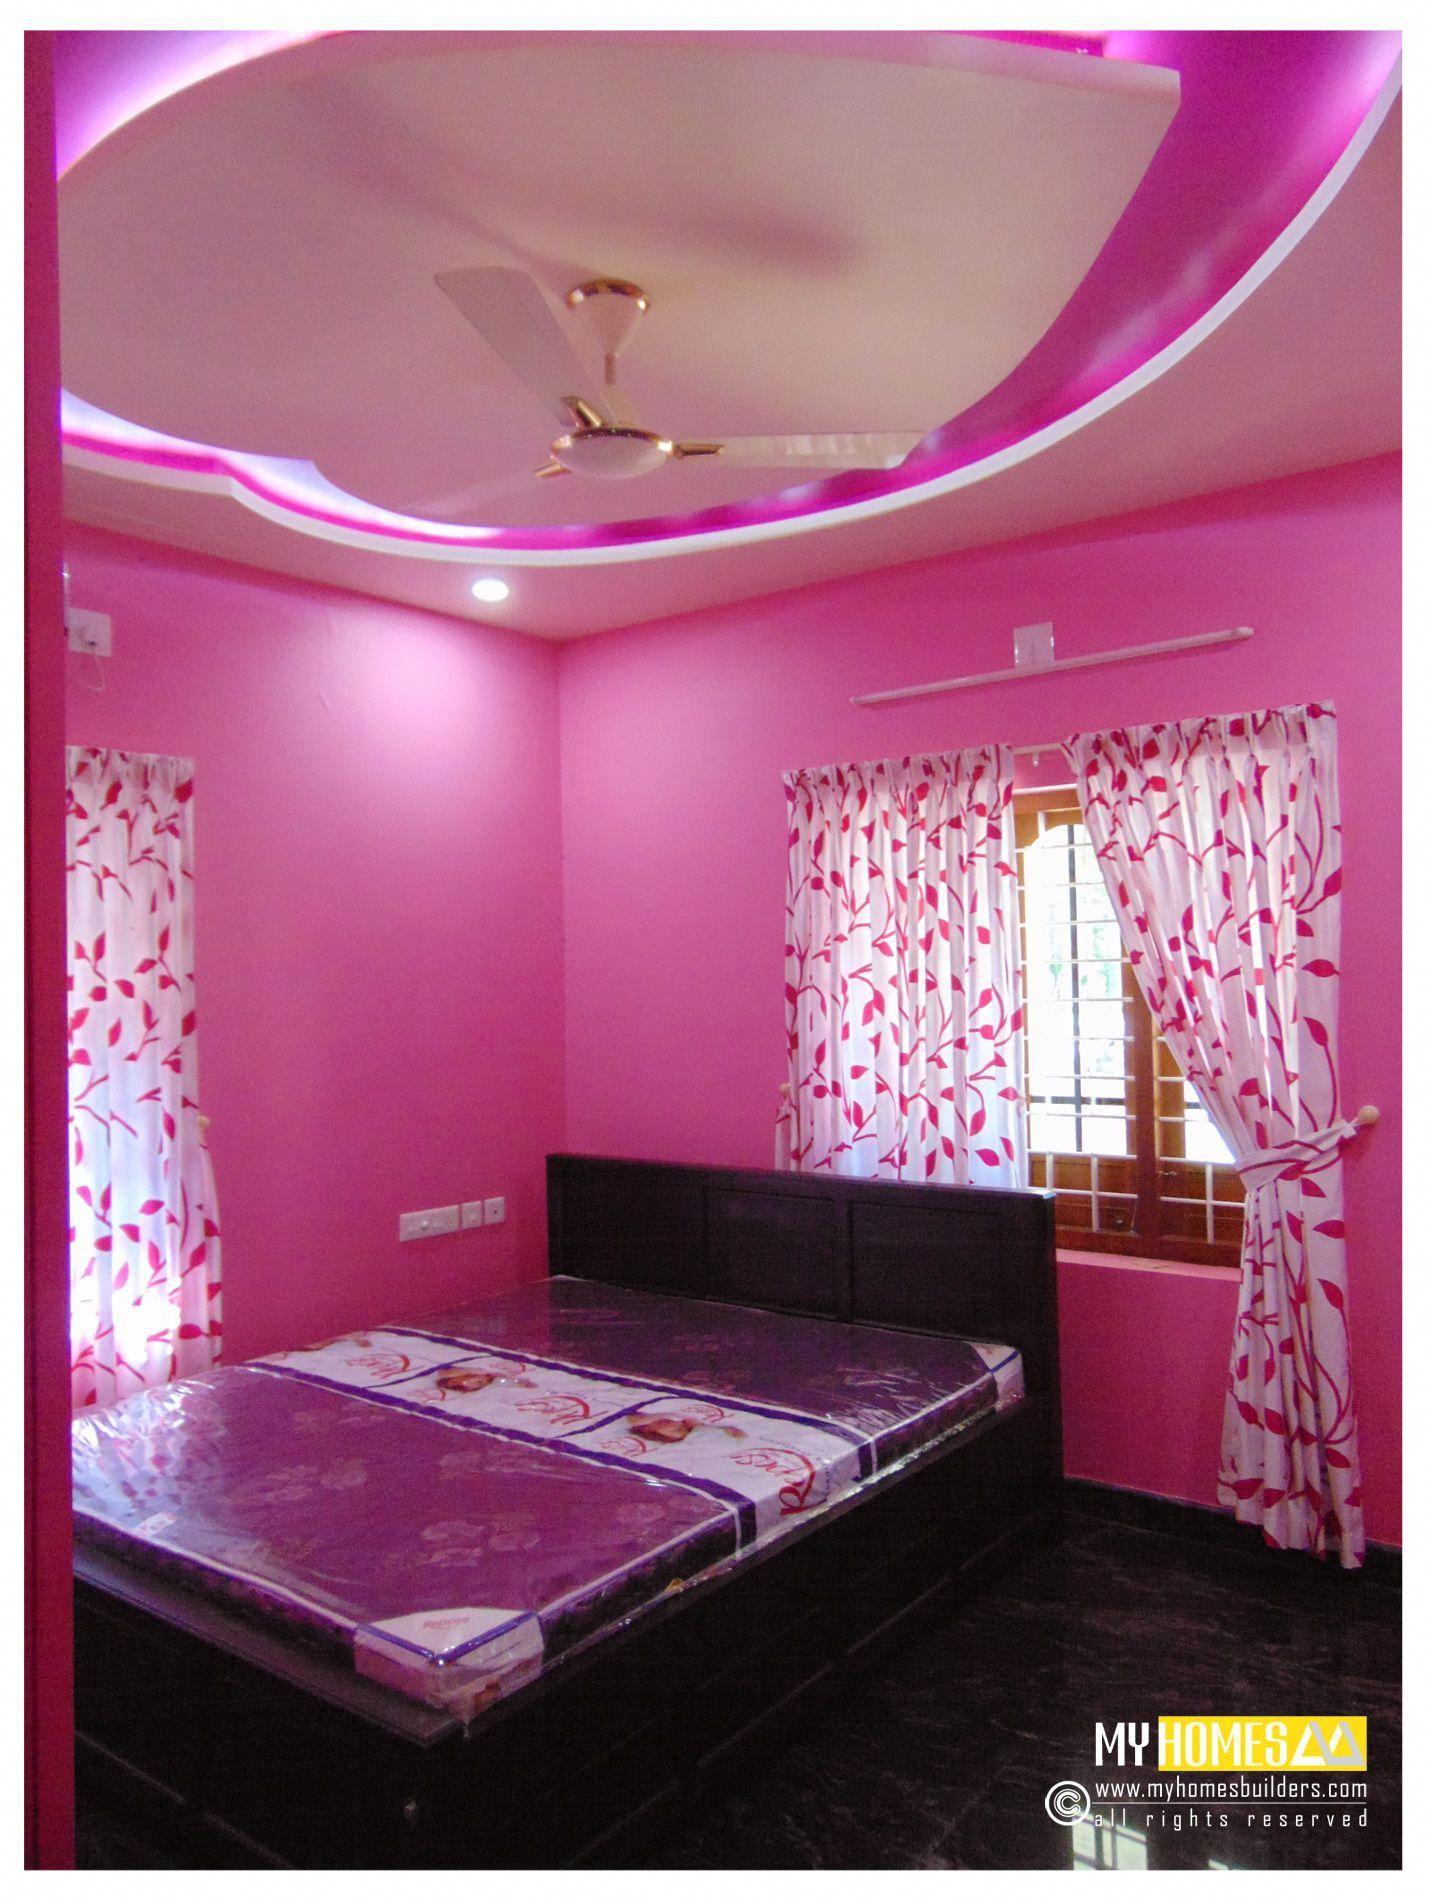 Simple Interior Bedroom Design Bedroominteriorplanningadvice Simple Bedroom Design Modern Bedroom Interior Simple Bedroom Interior bedroom best home design